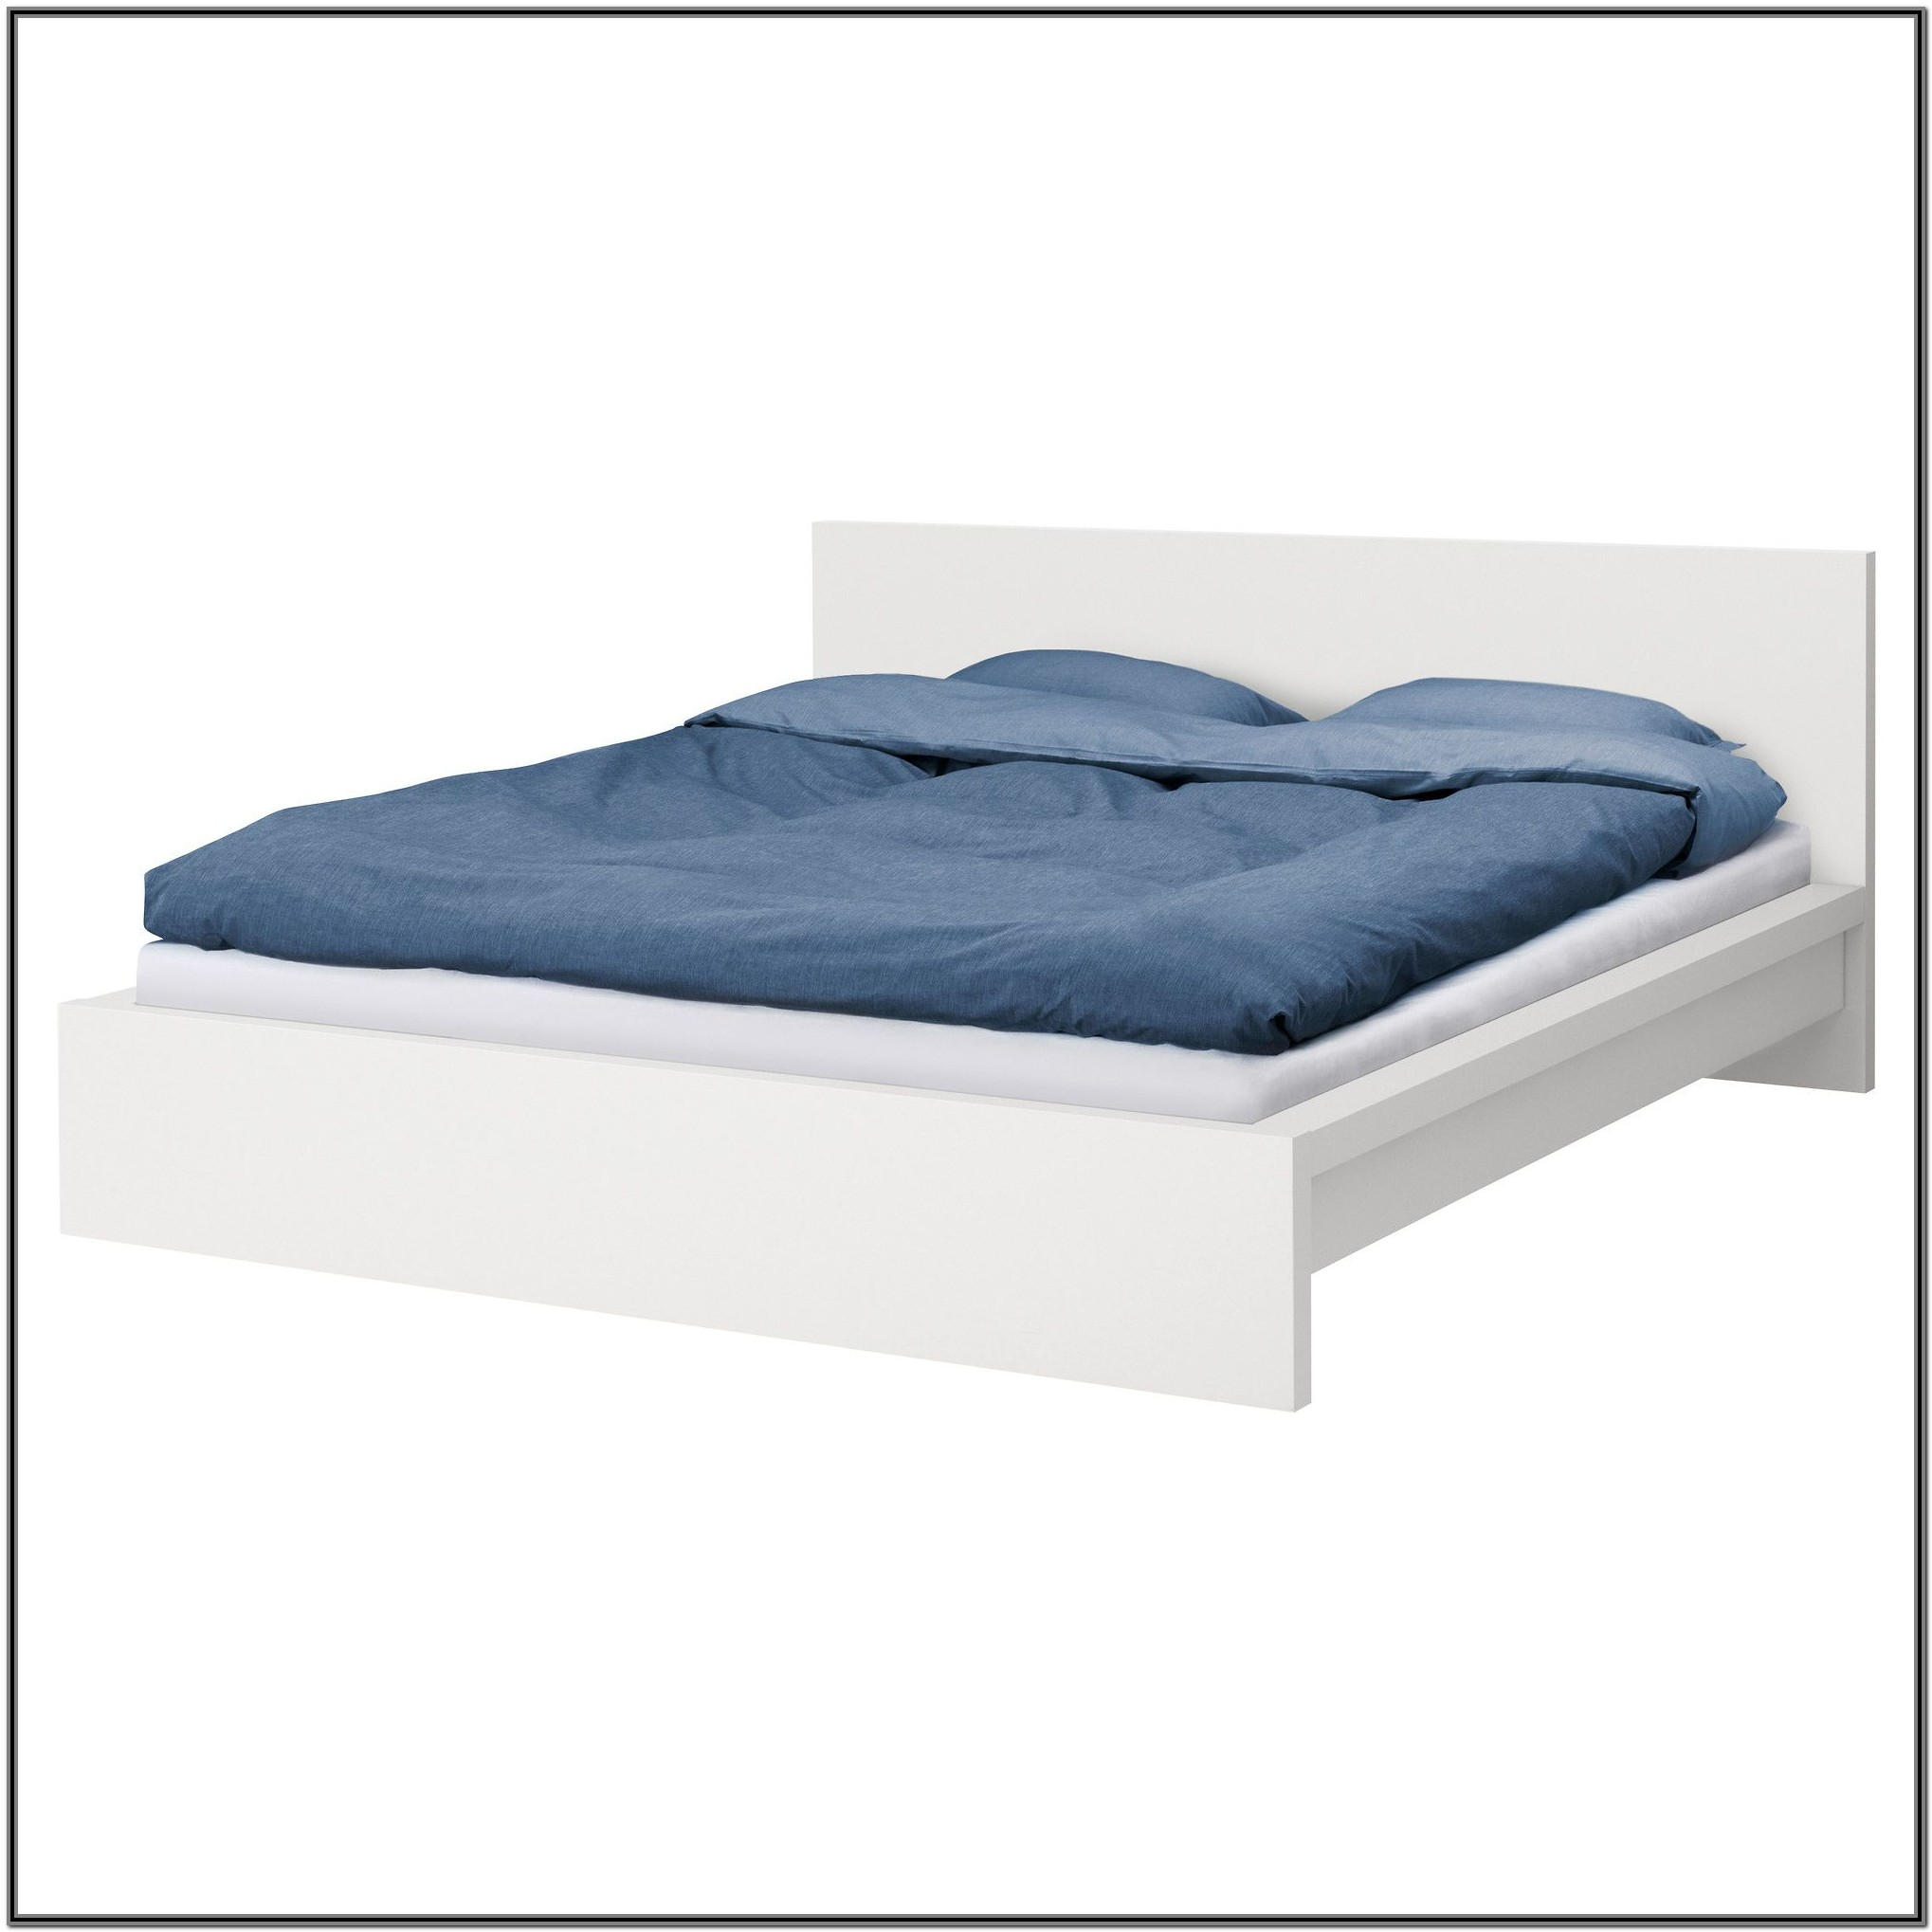 Ikea Malm Bed Frame White